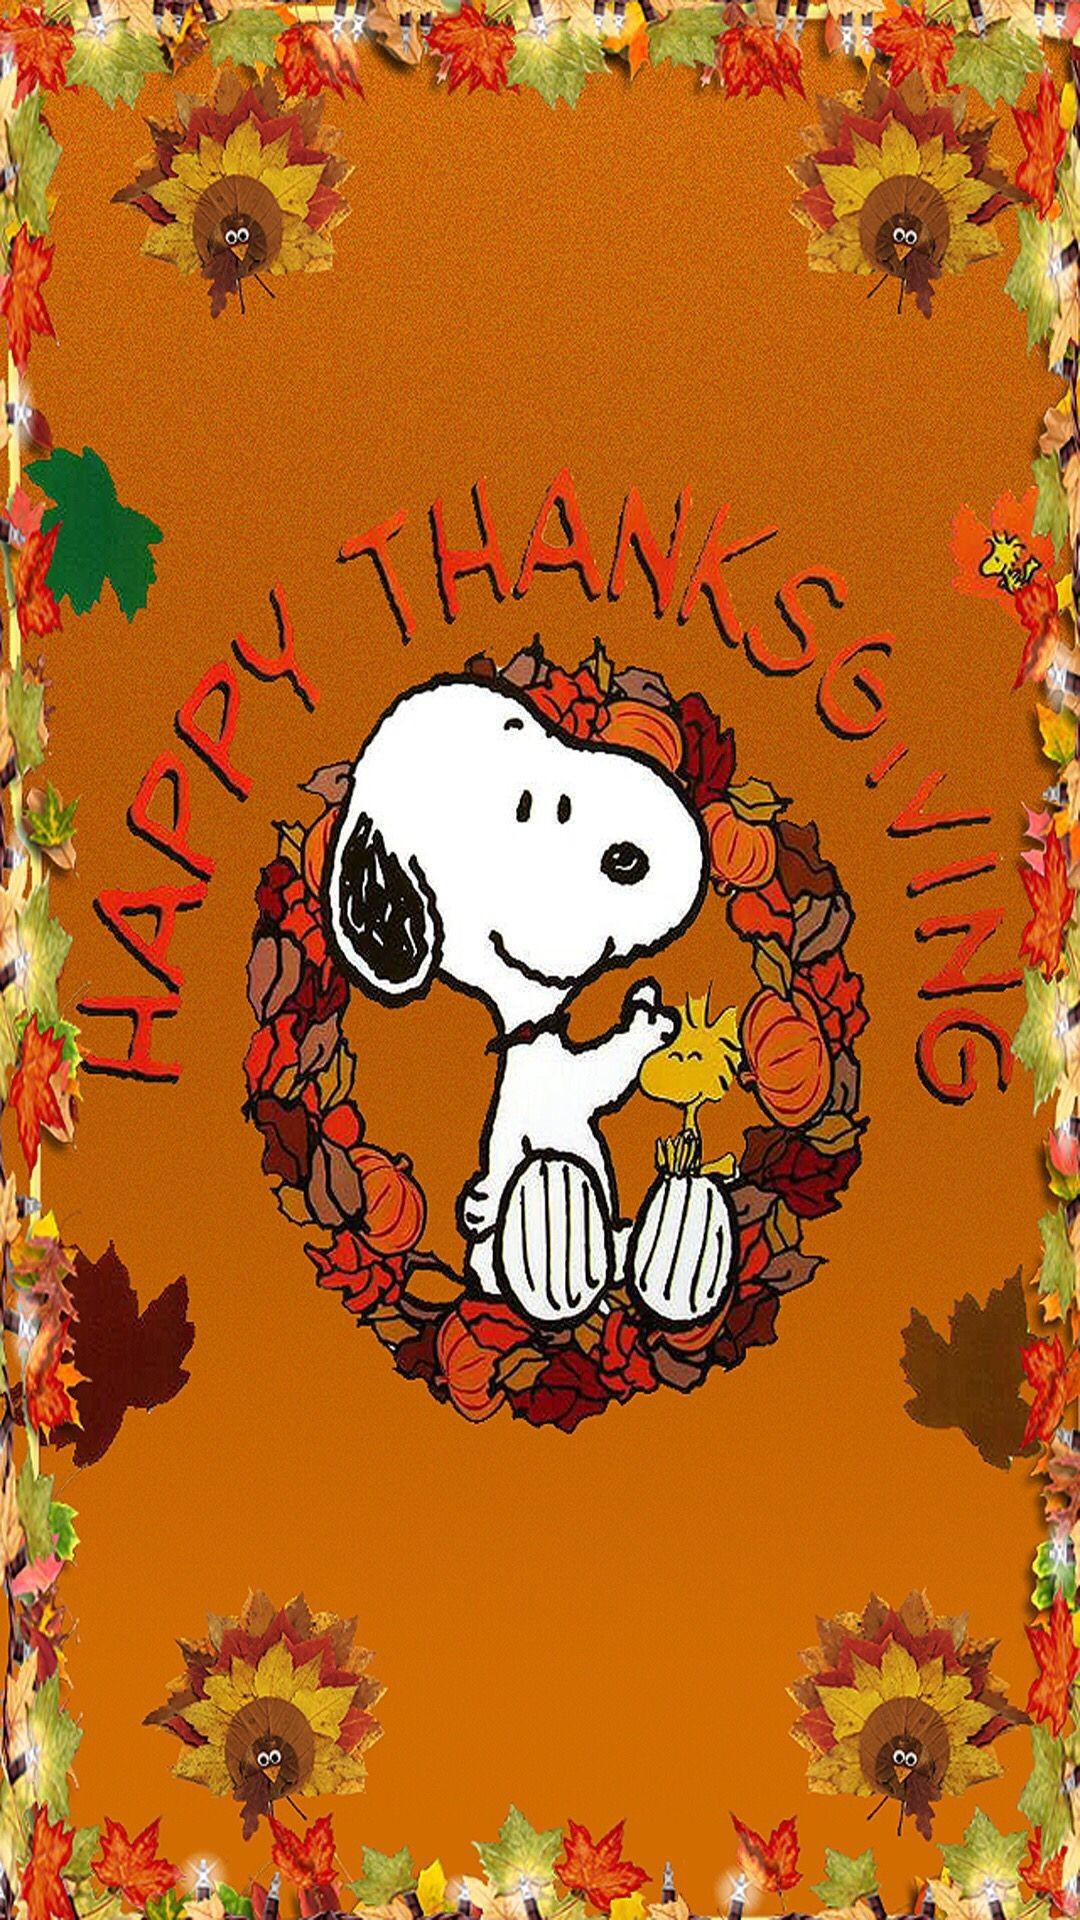 Res: 1080x1920, Snoopy Happy Thanksgiving Wallpaper -Zedge